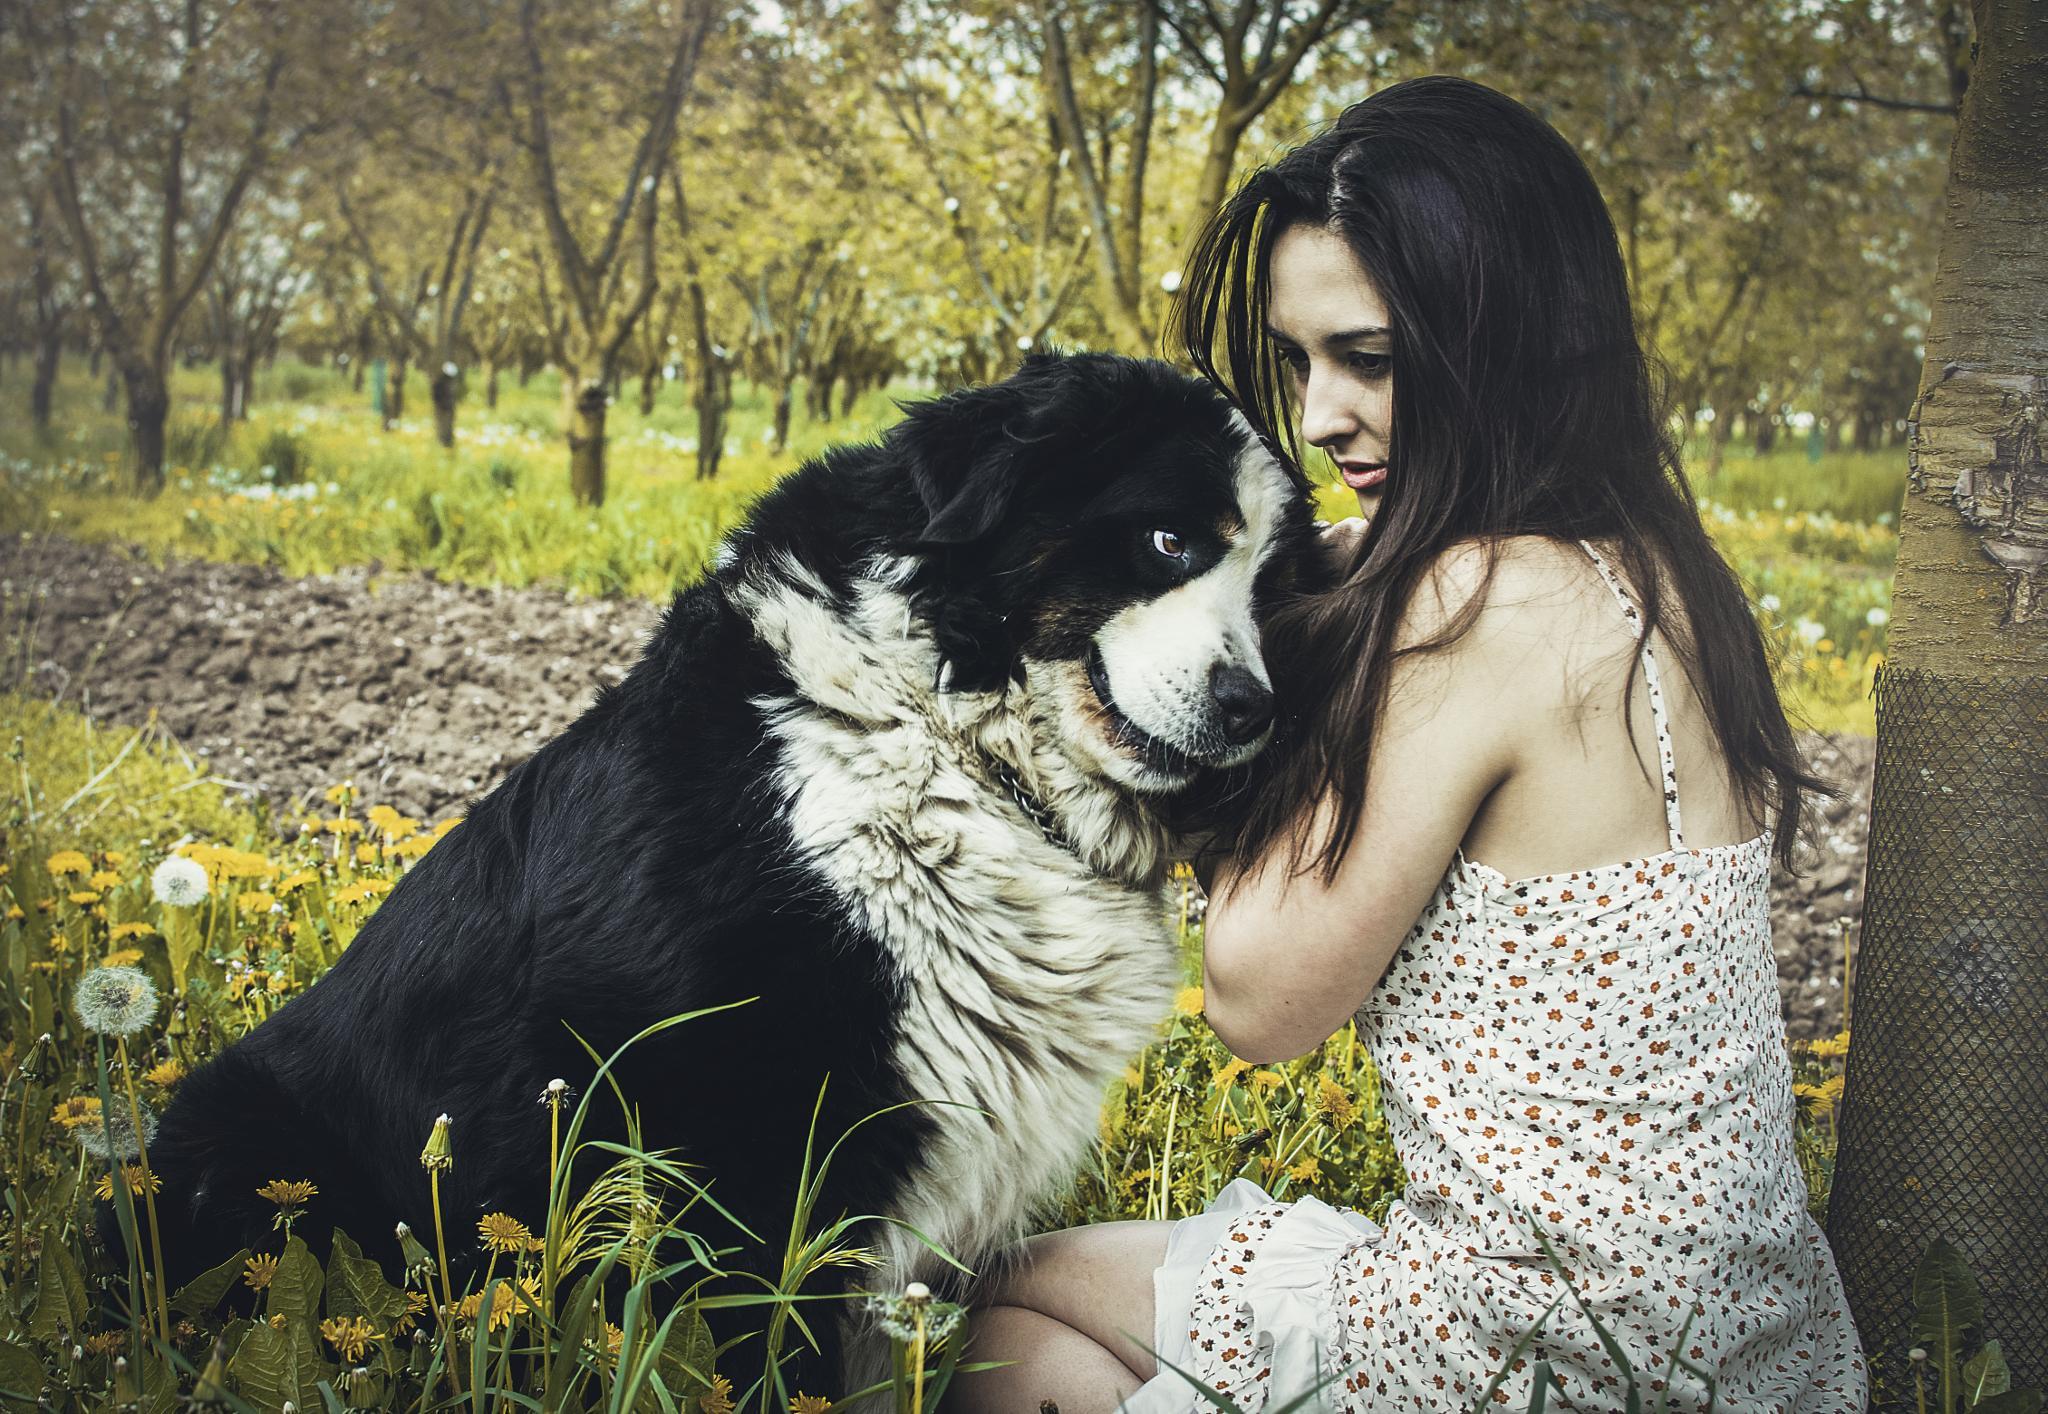 Kate and dog by Jakub Doupovec